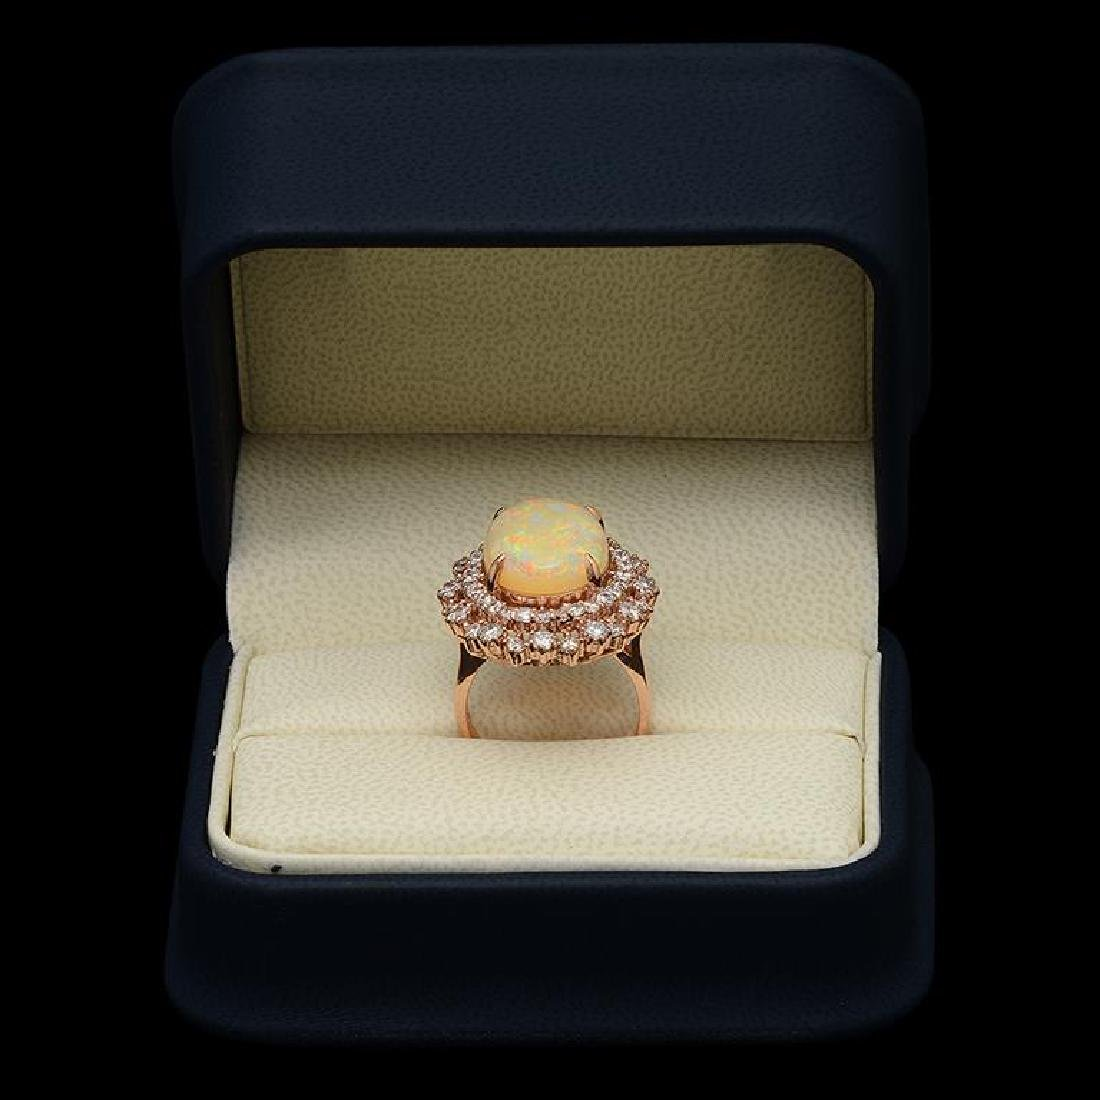 14K Gold 5.91ct Opal 1.85ct Diamond Ring - 3